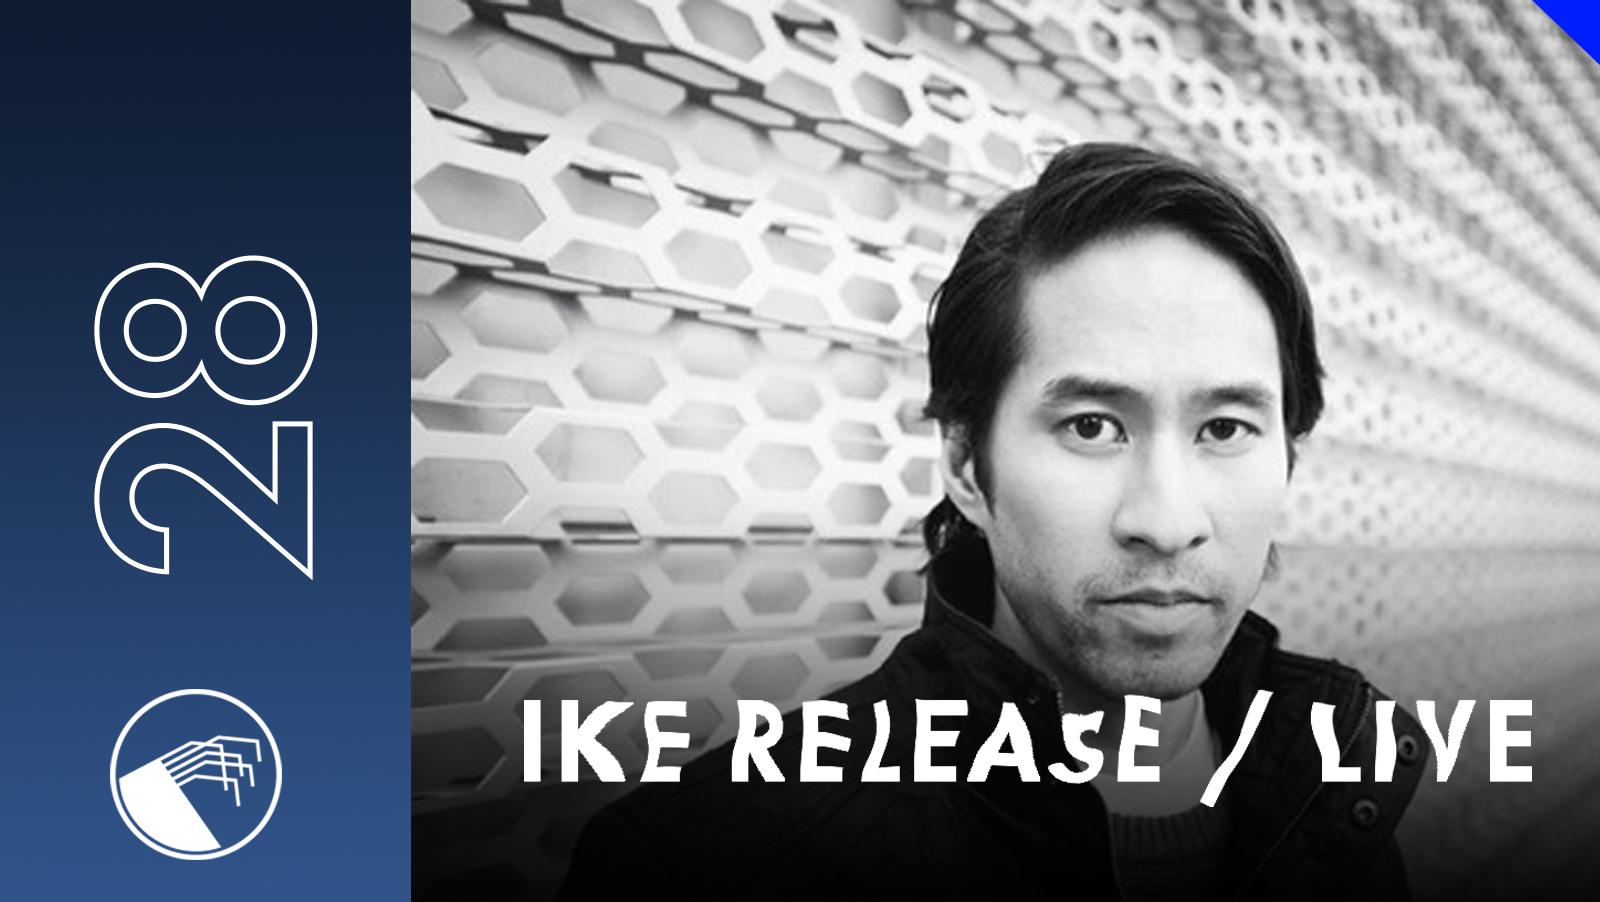 028 Ike Release LIVE